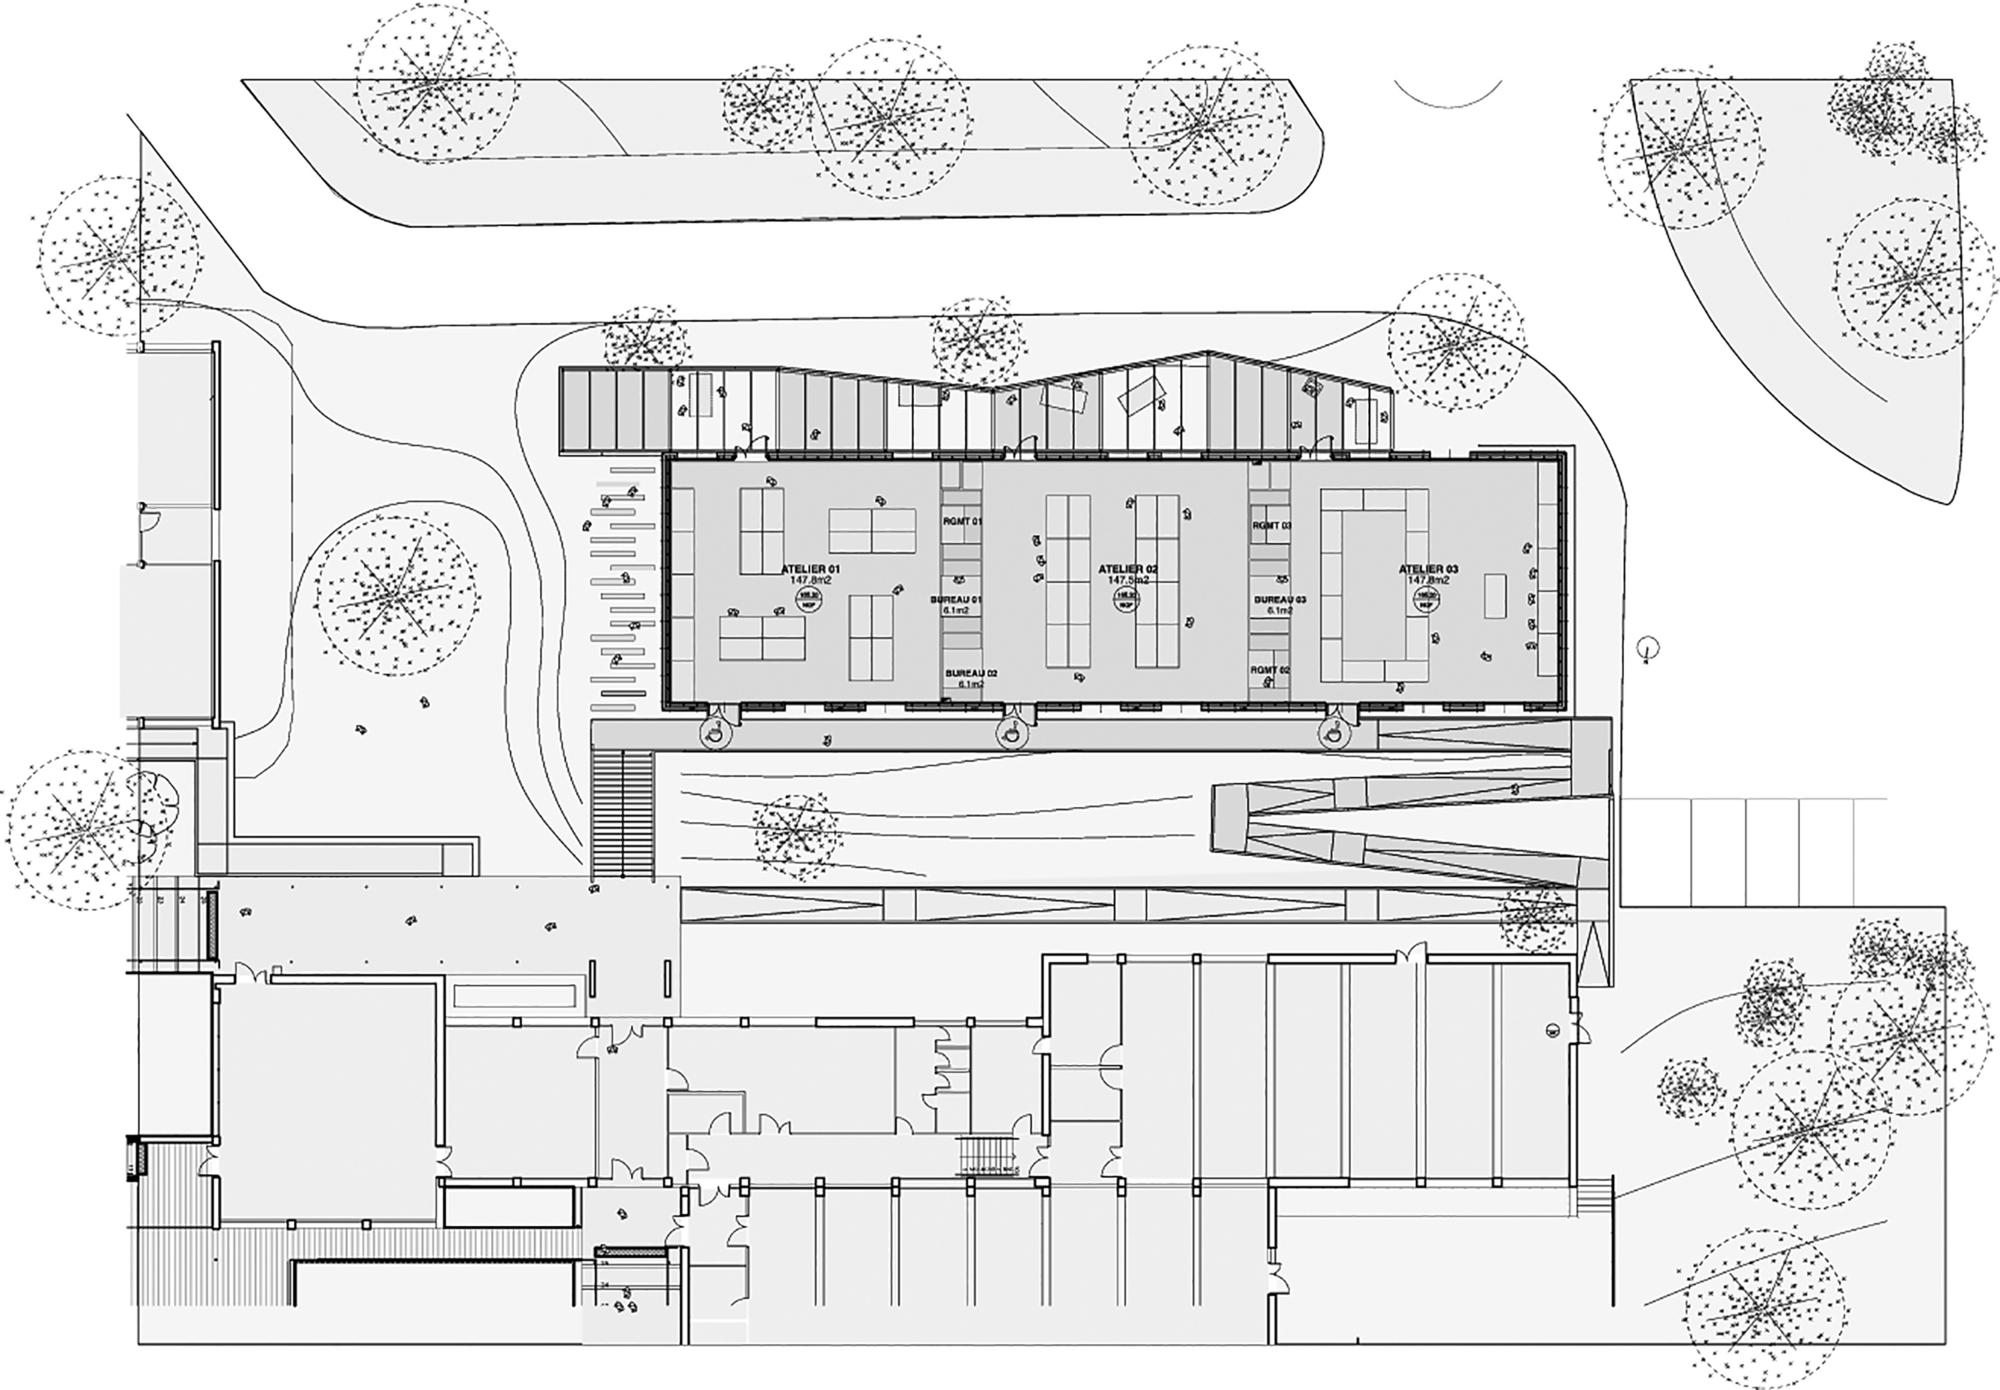 plan architecture floor extension pan marseille